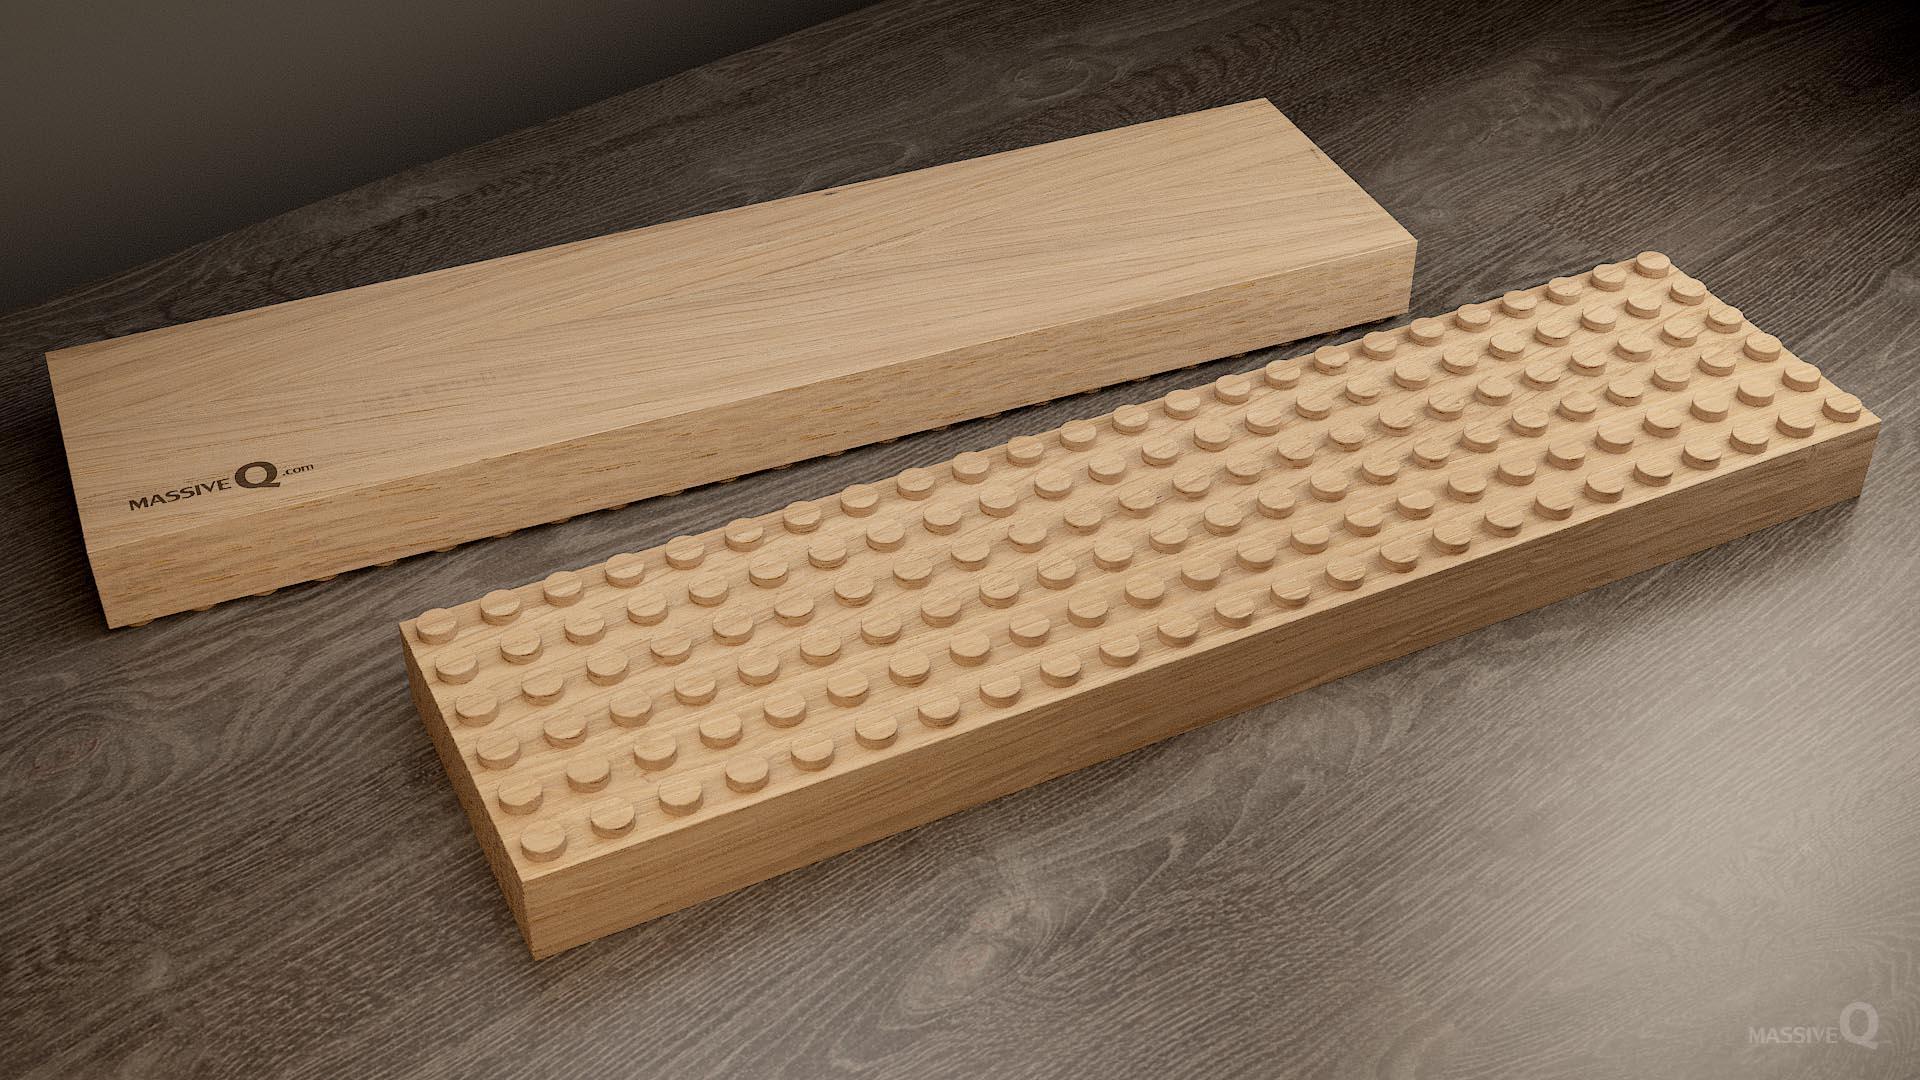 Q Baseplate 6x24x4 – Oak